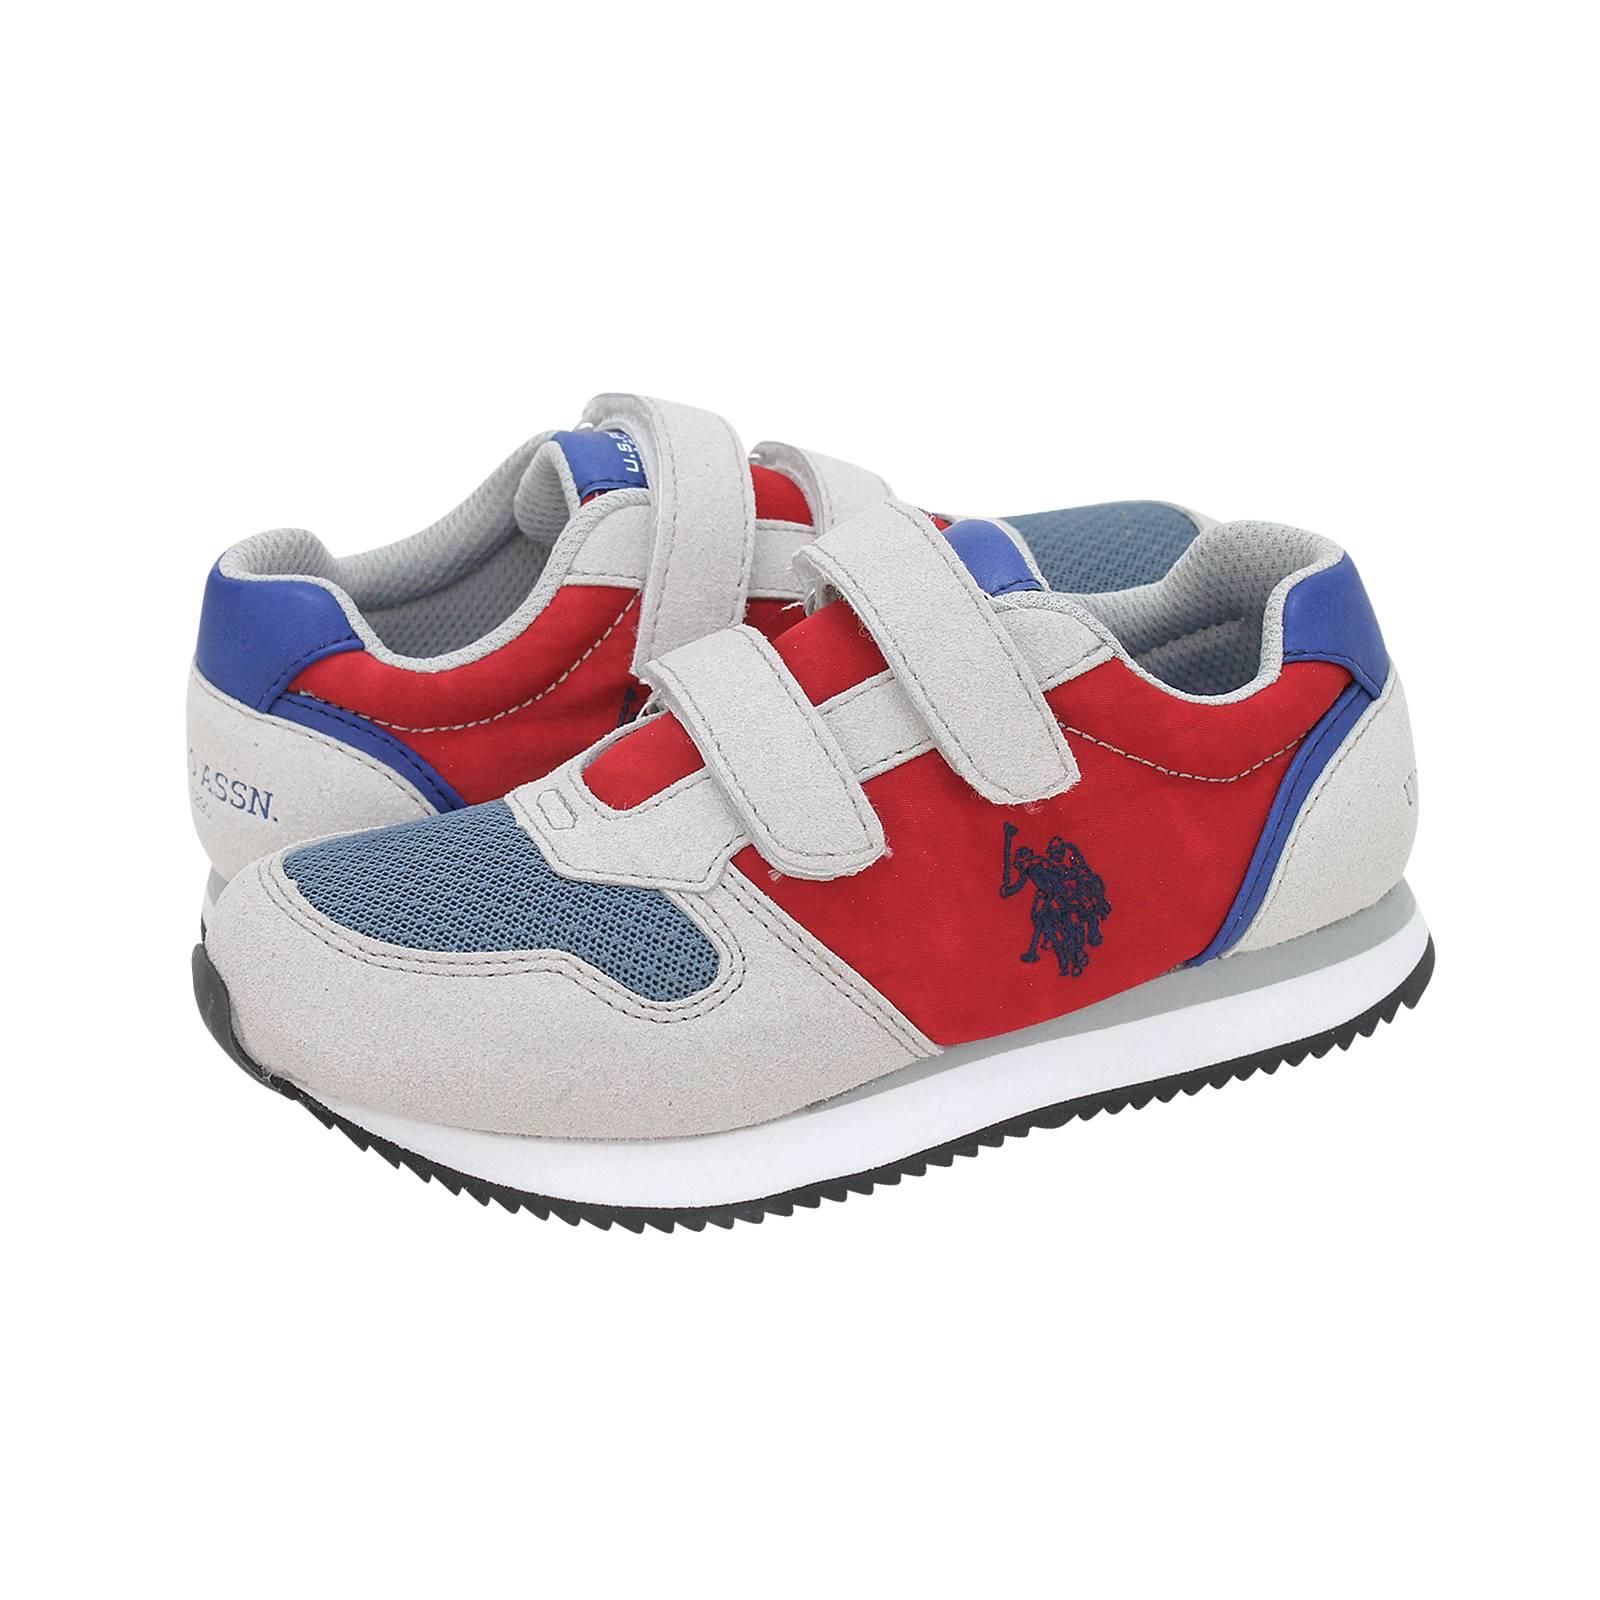 8412190c72b Sunny 1 - Παιδικά παπούτσια casual U.S. Polo ASSN από καστορι ...